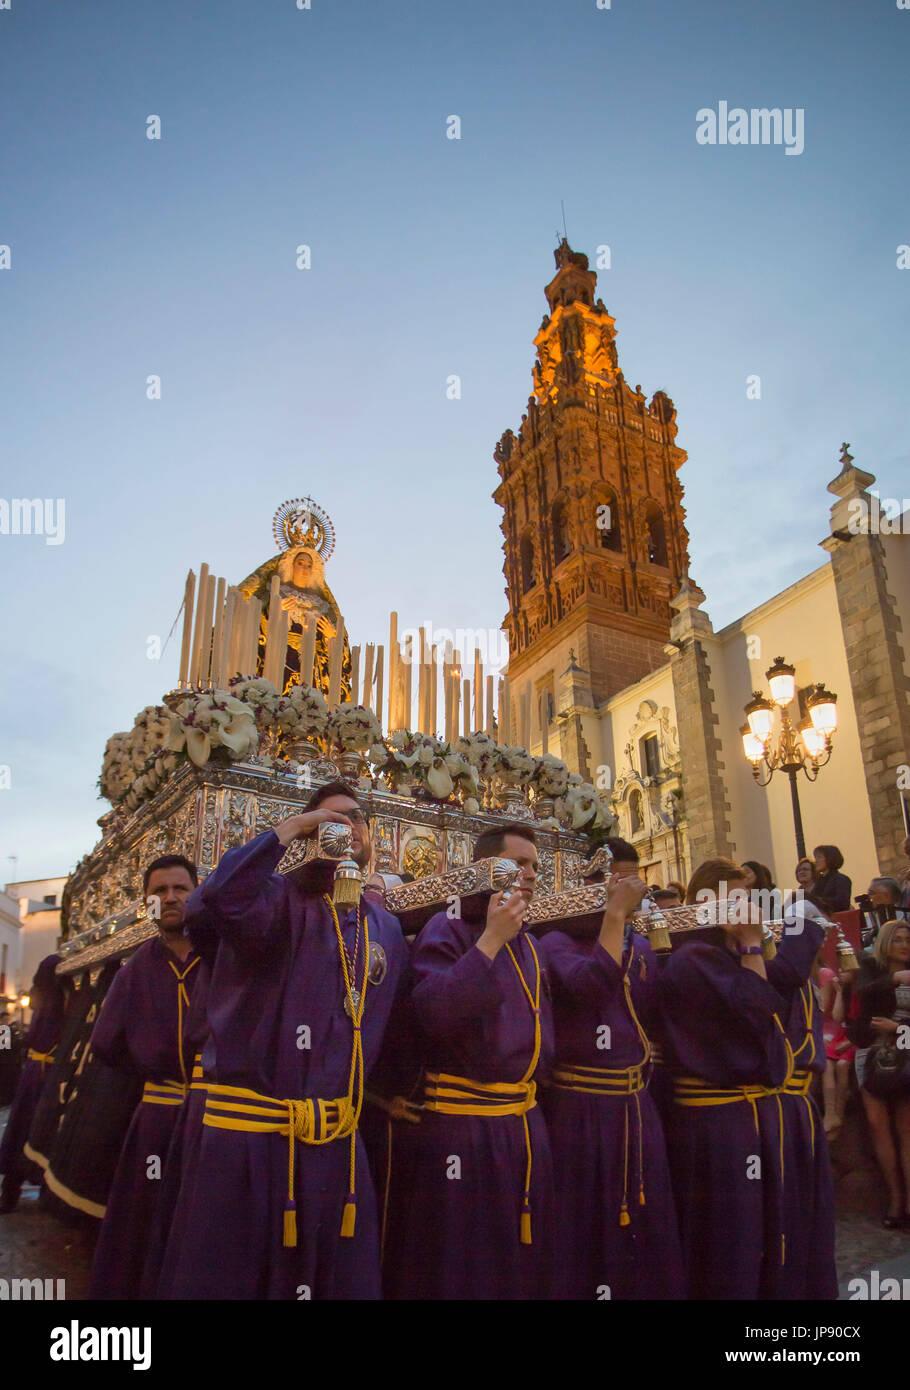 Spagna, regione dell'Extremadura, Jerez de los Caballeros Città, Venerdì Santo parade, Chiesa di San Miguel Foto Stock